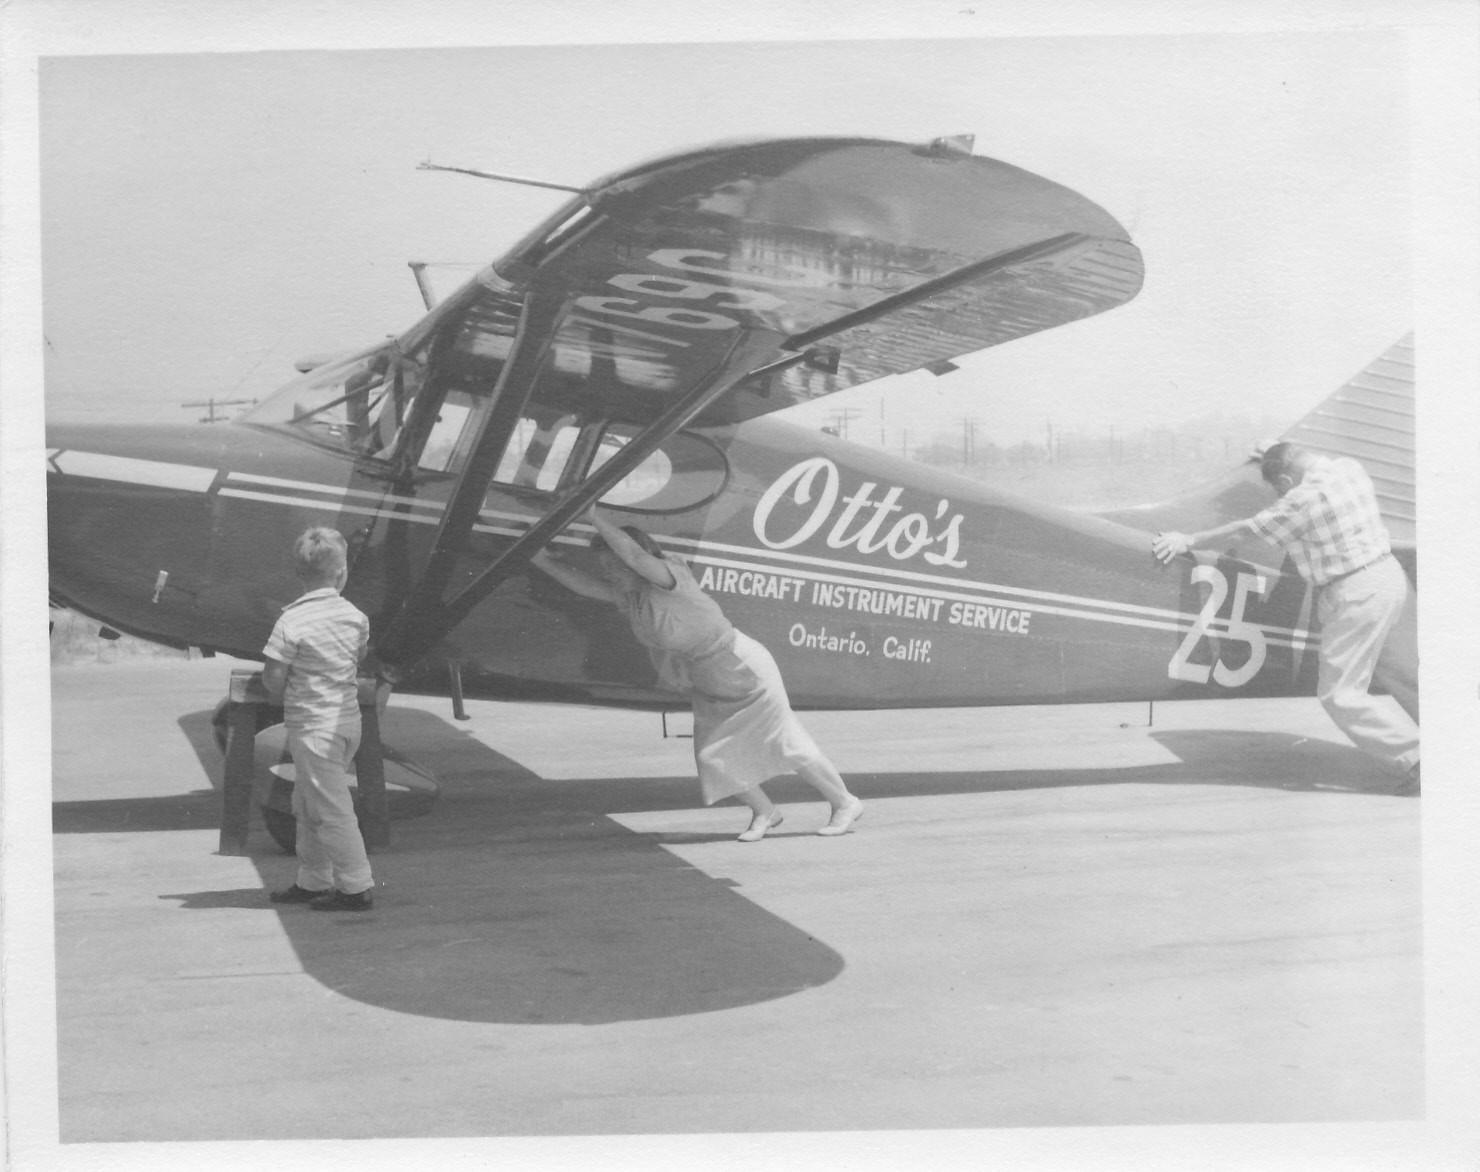 Otto Instrument and Avionics | LinkedIn